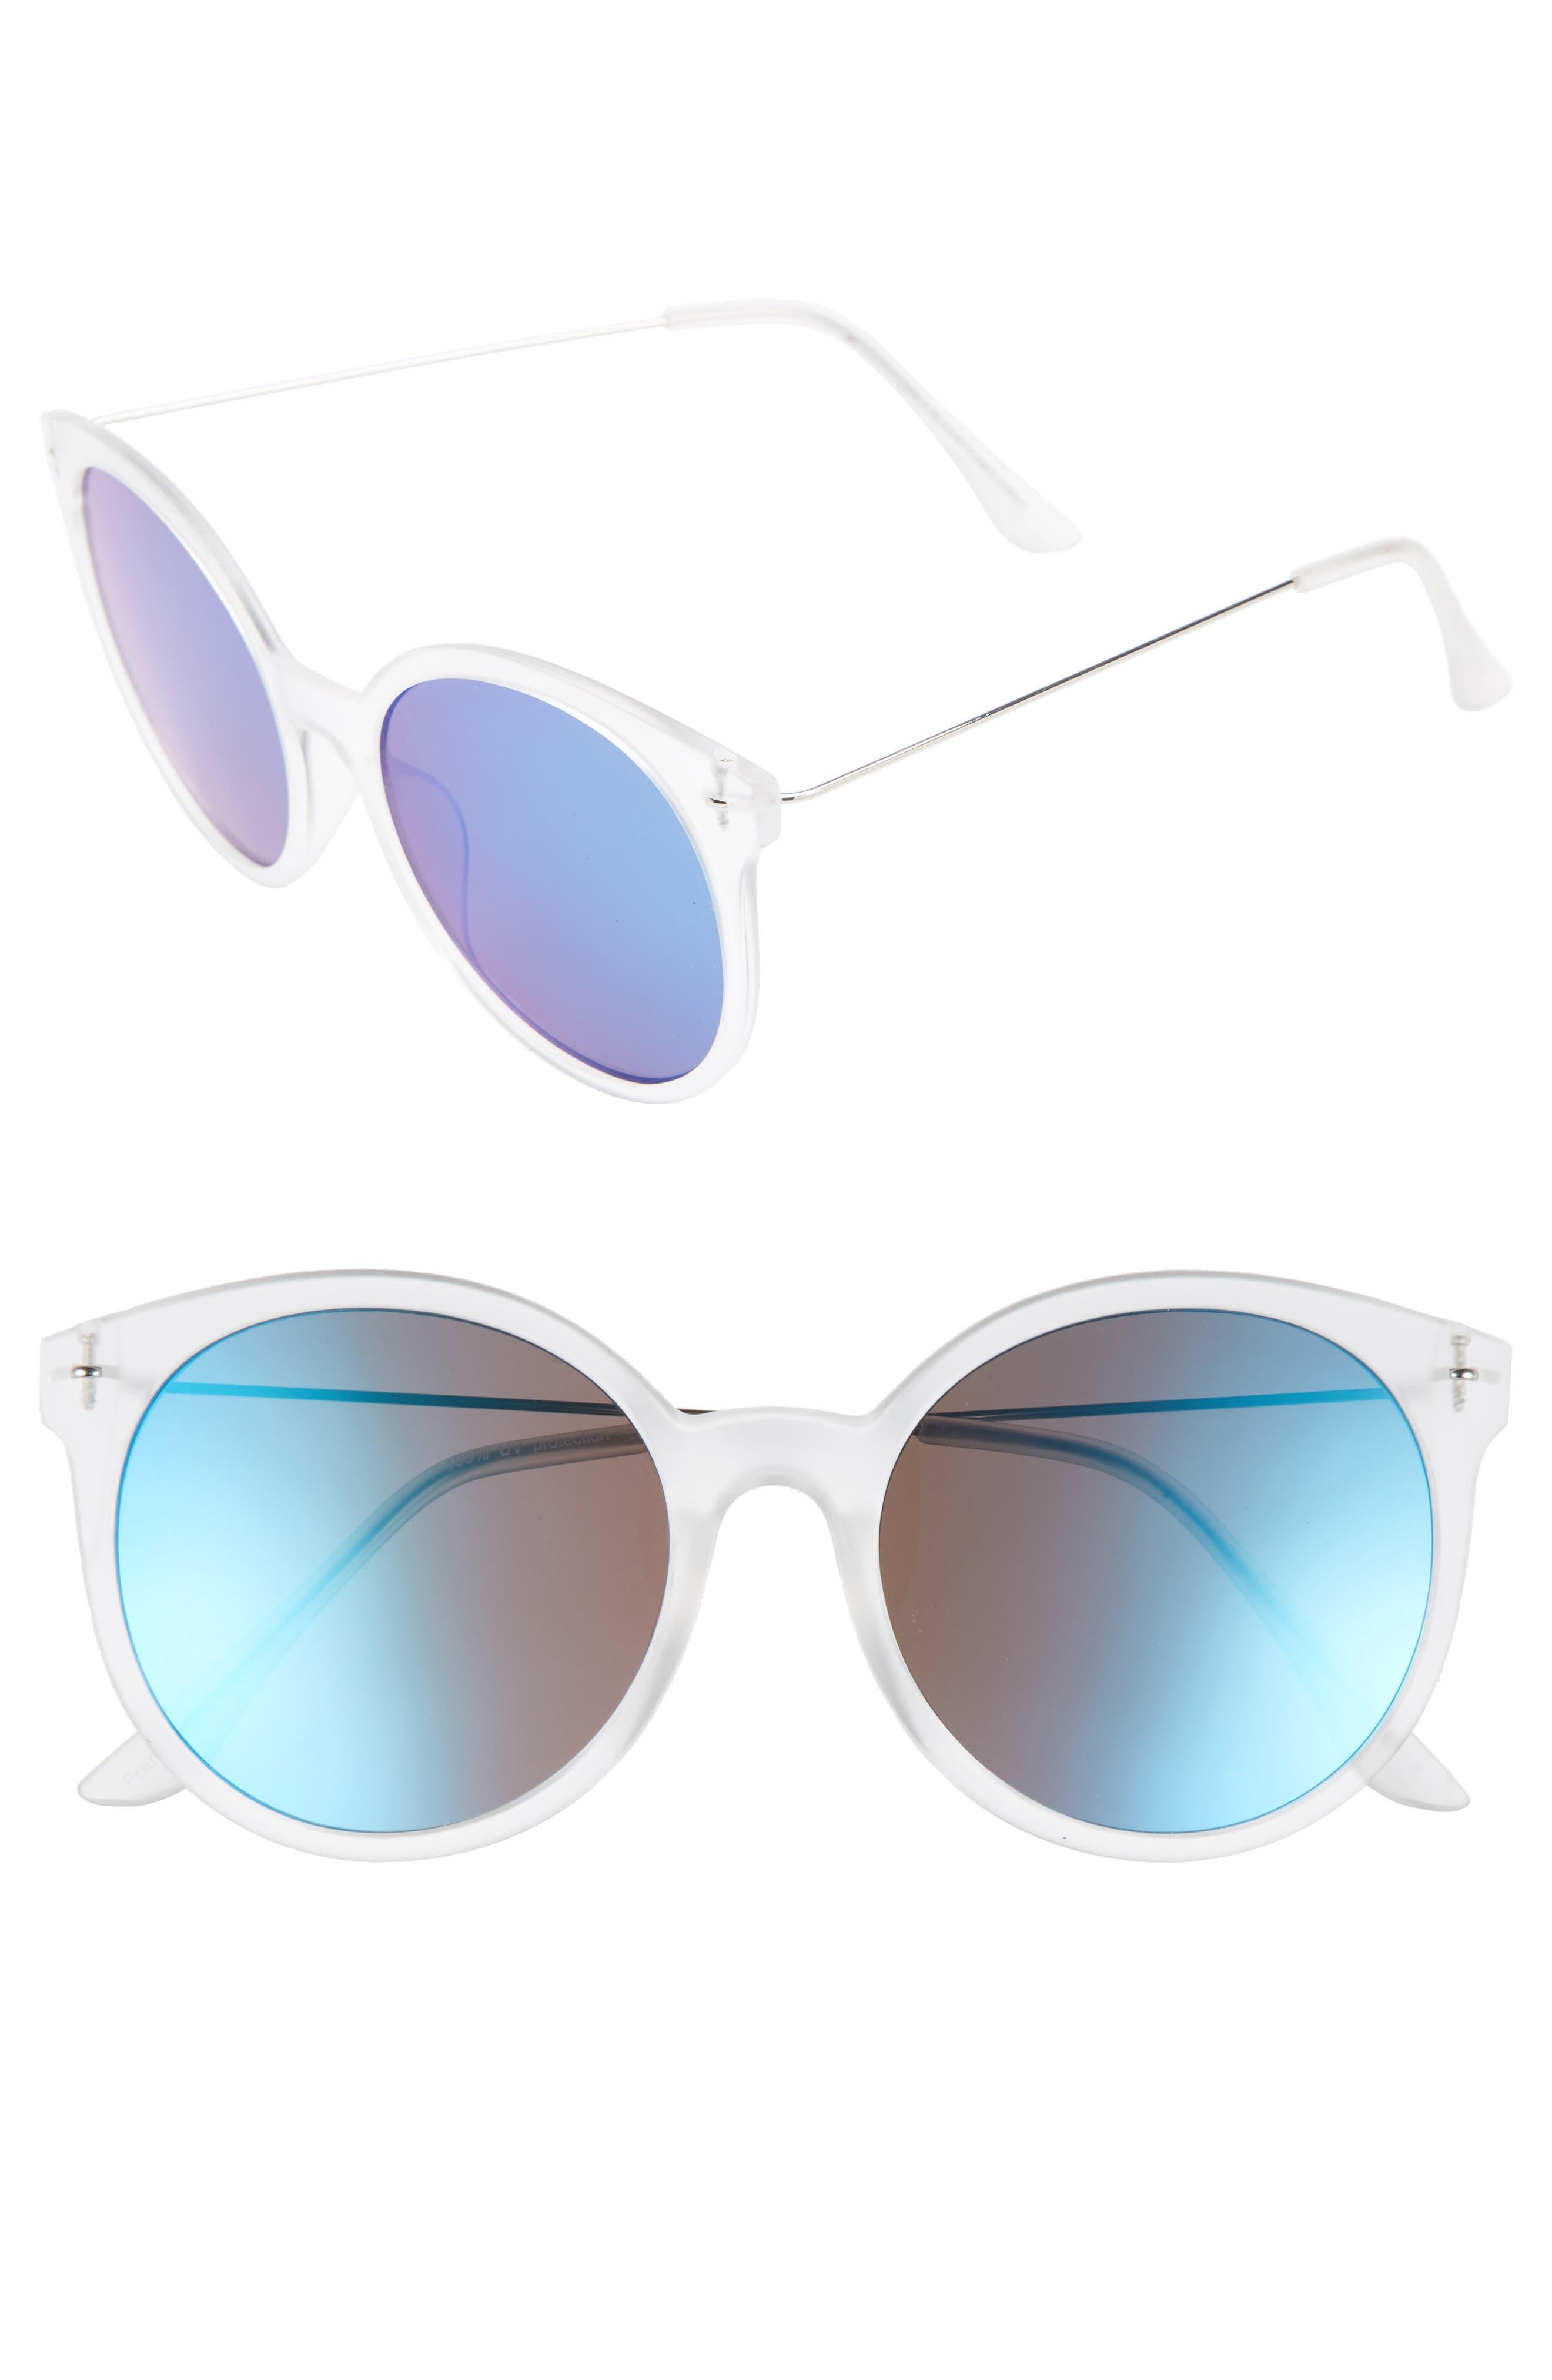 62mm Transparent Round Lens Sunglasses,                             Main thumbnail 1, color,                             Clear/ Blue